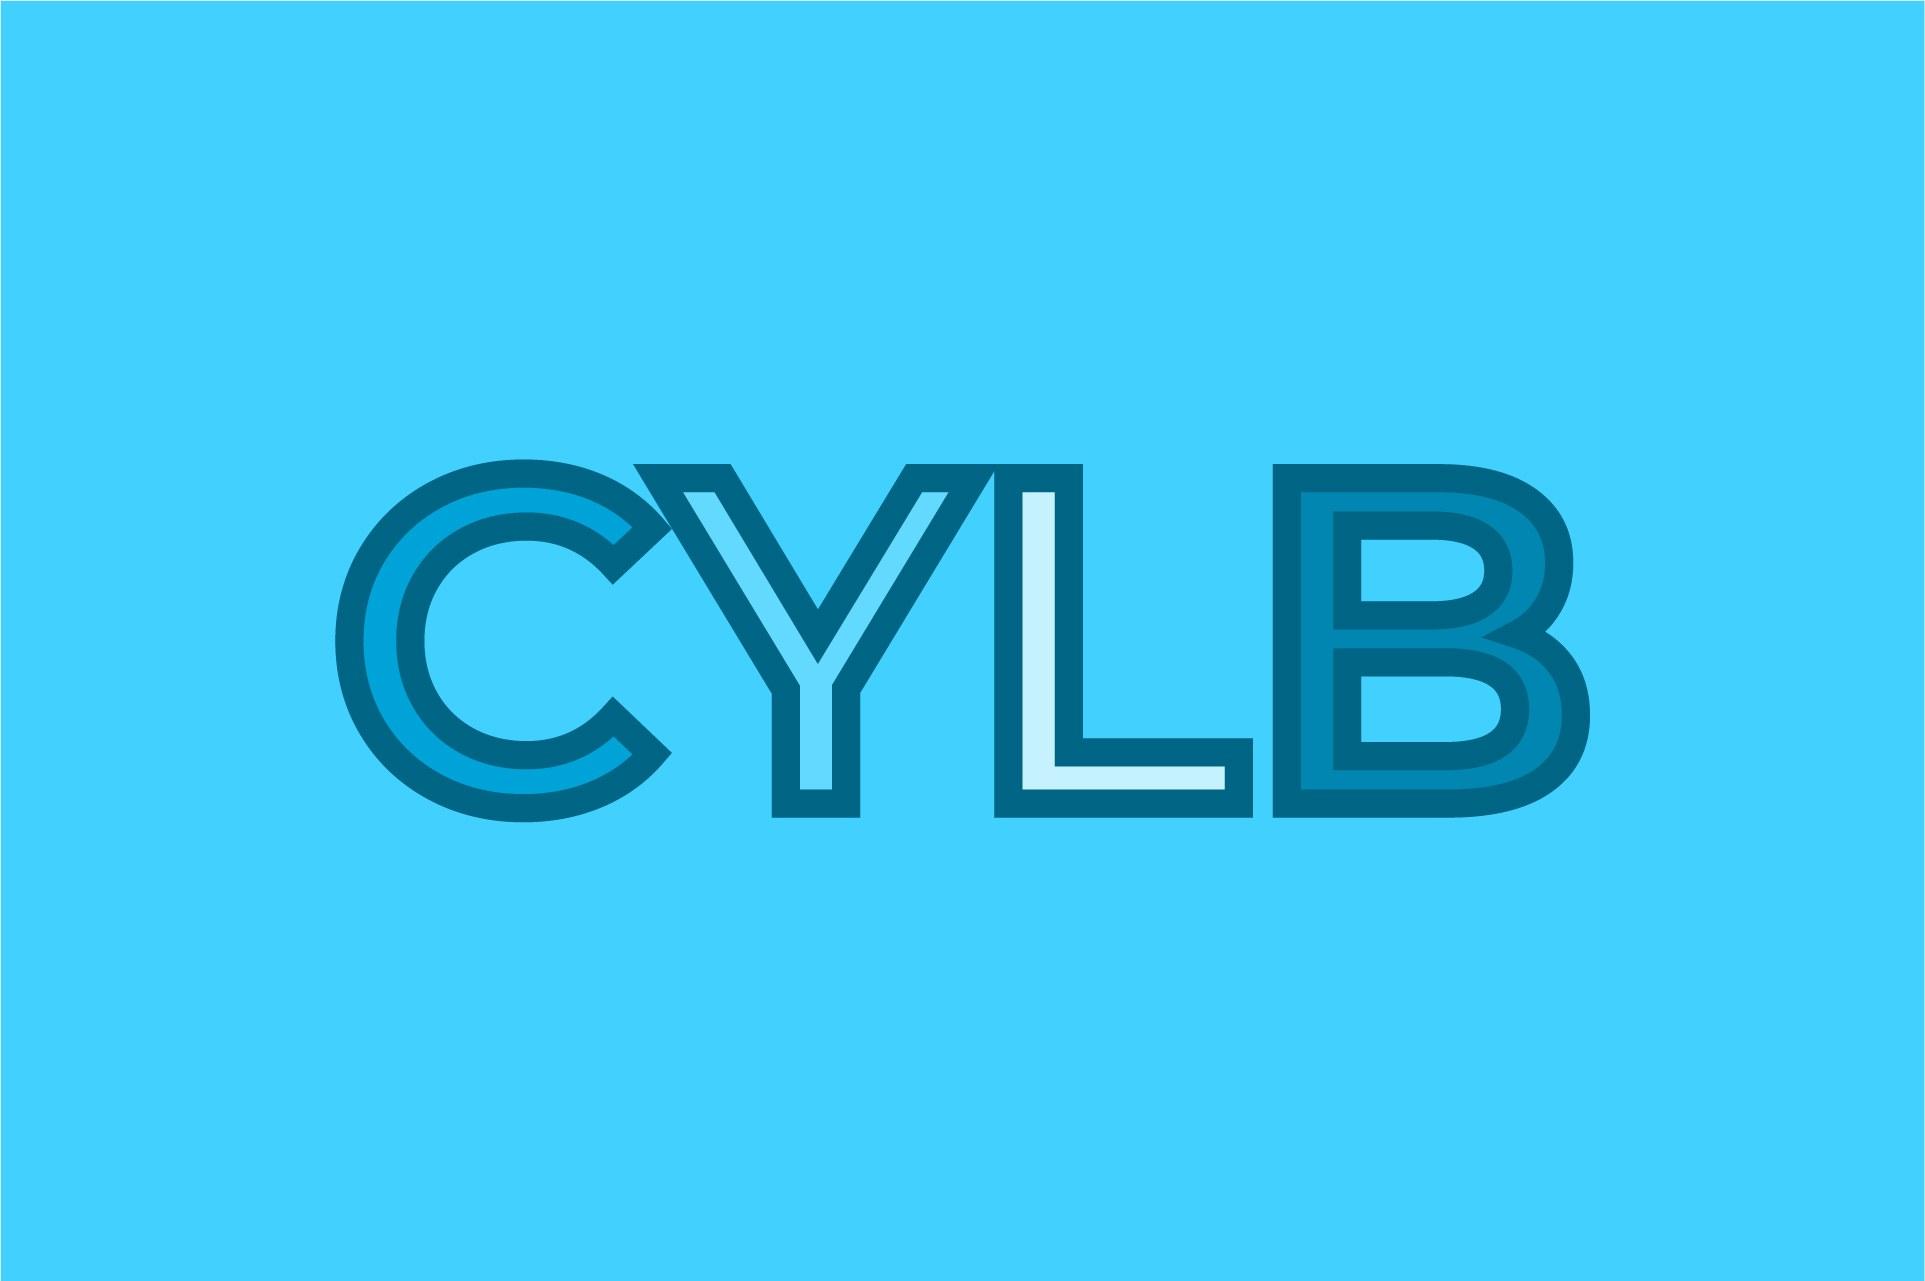 claim your life back acronymn